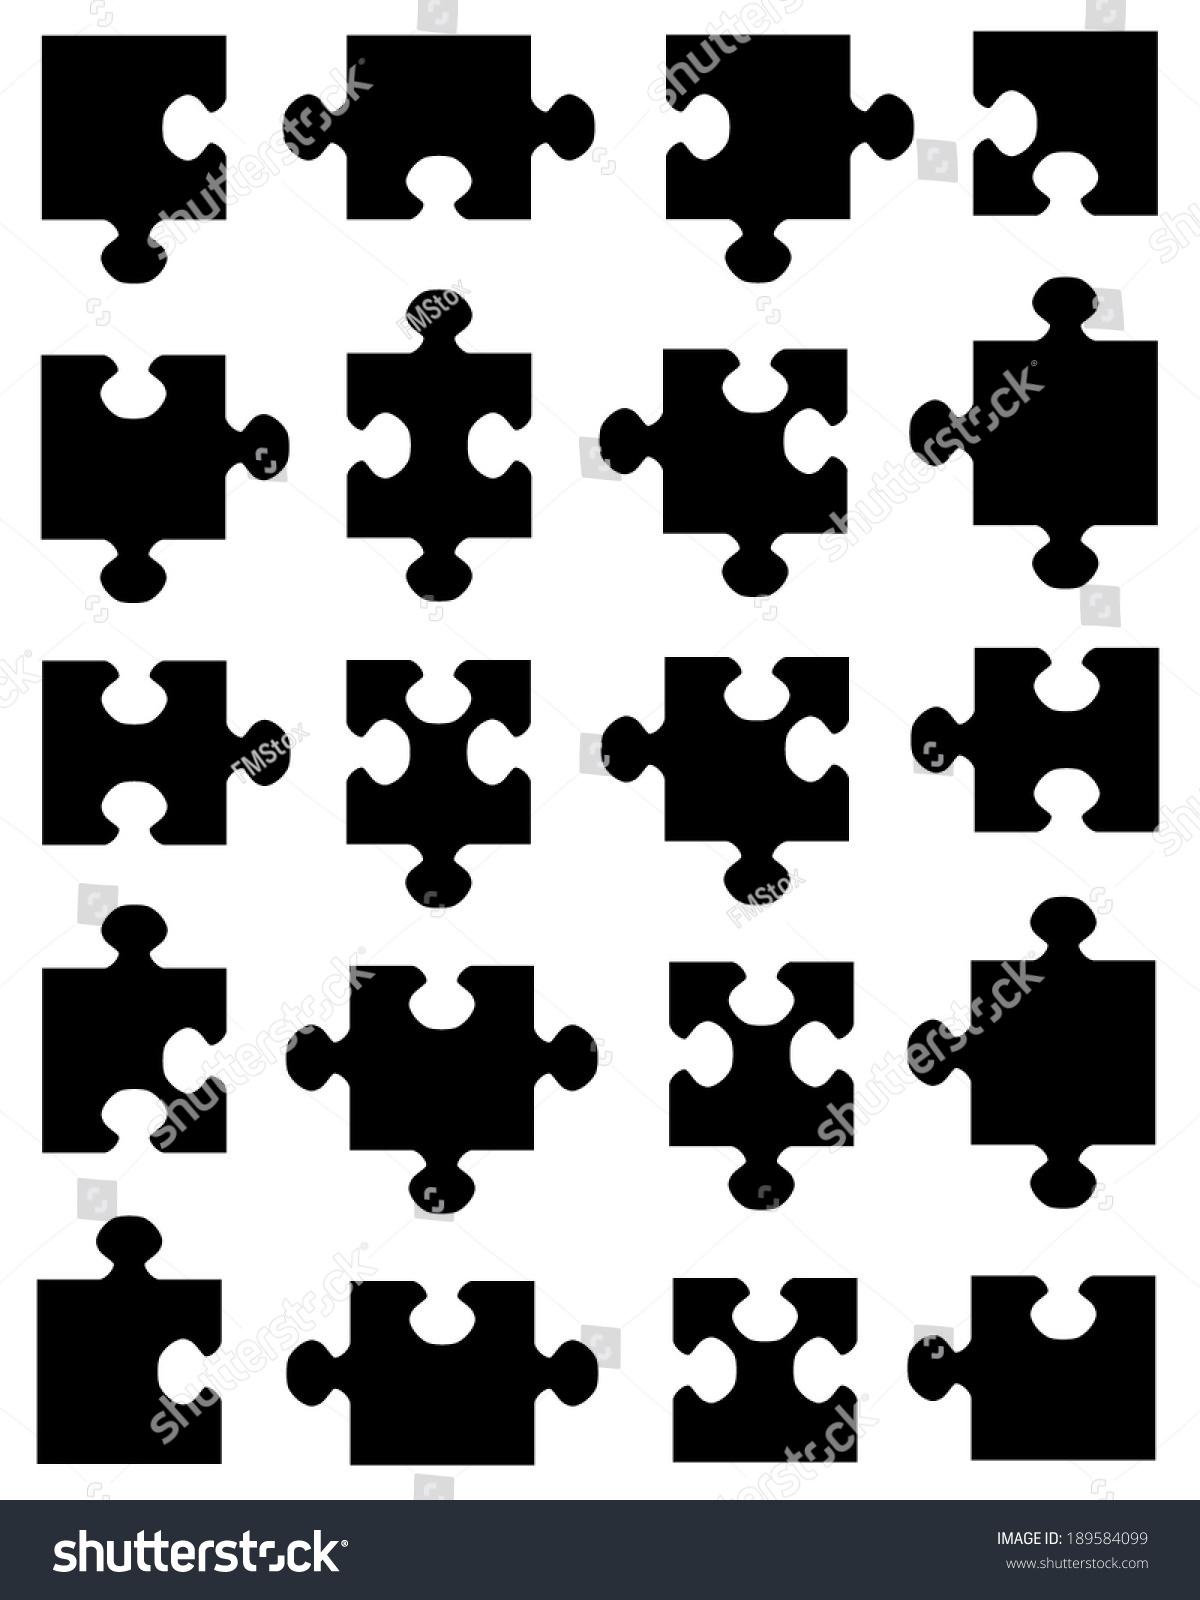 Collection Vector Jigsaw Puzzle Pieces Stock Vector 189584099 ...